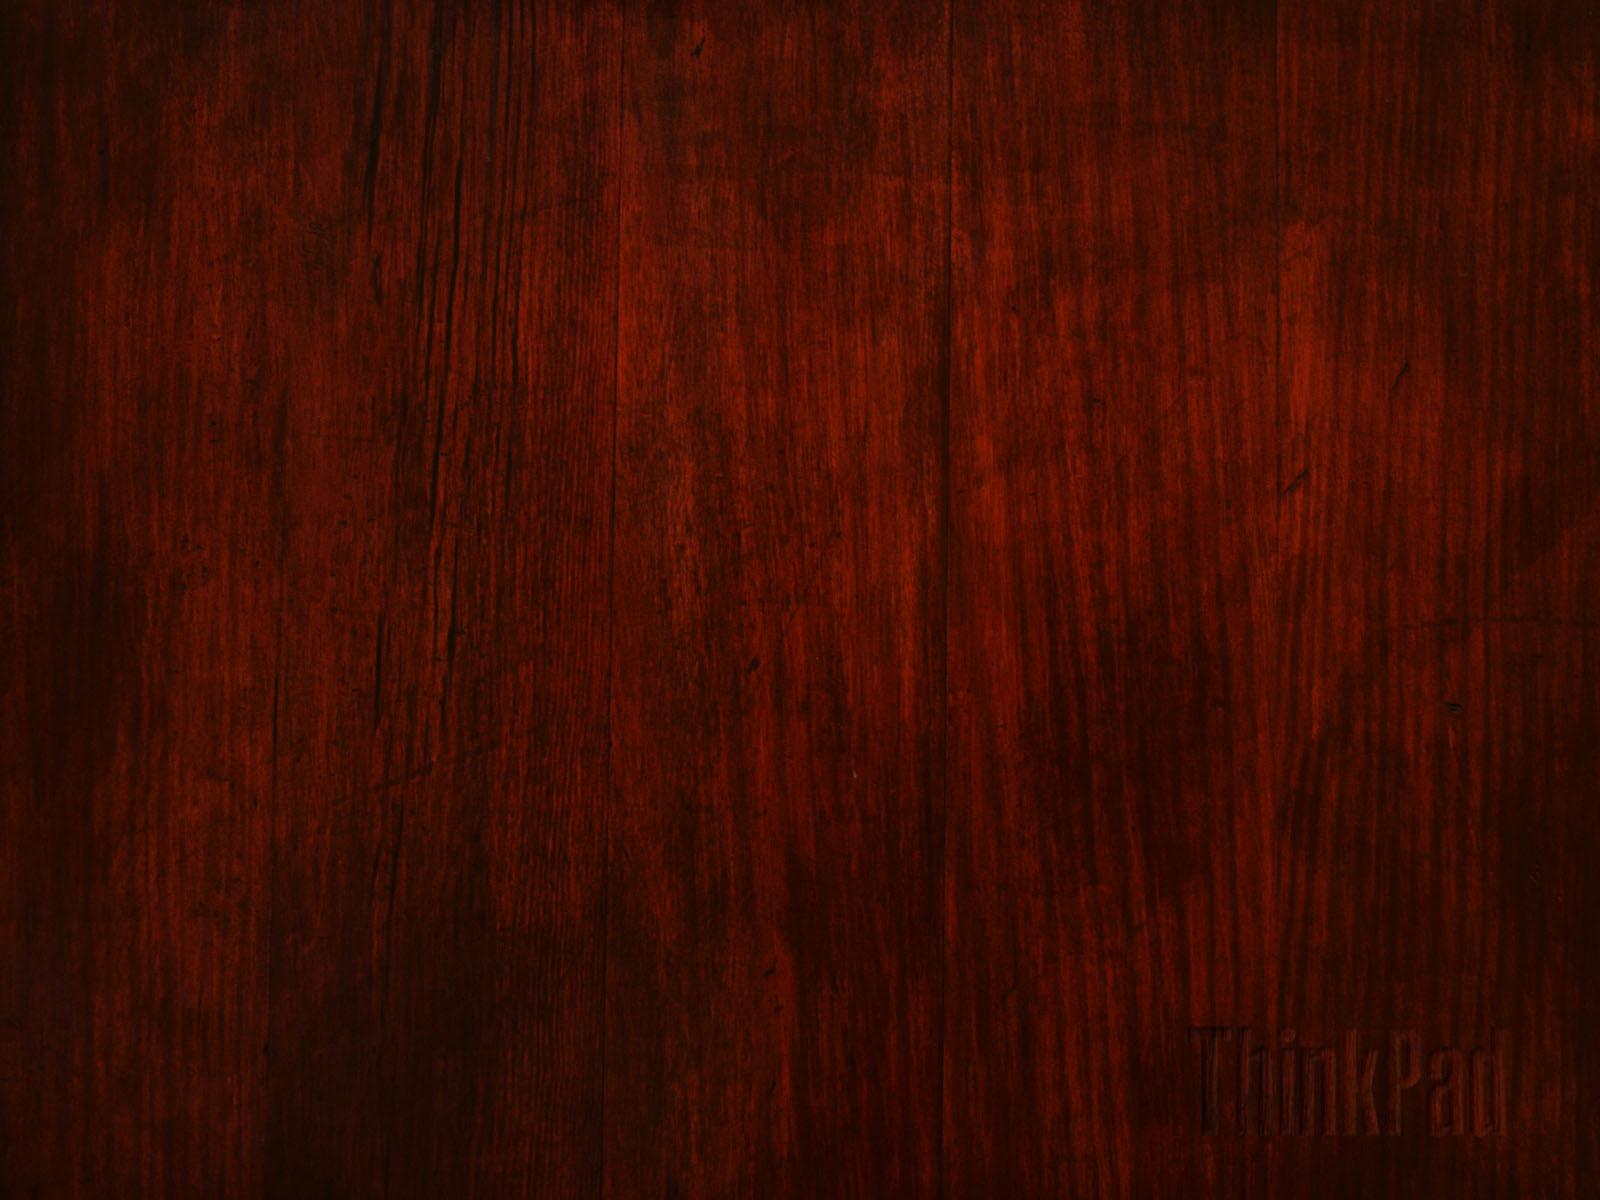 Brazilian Cherry Dark Brazilian Cherry Wood